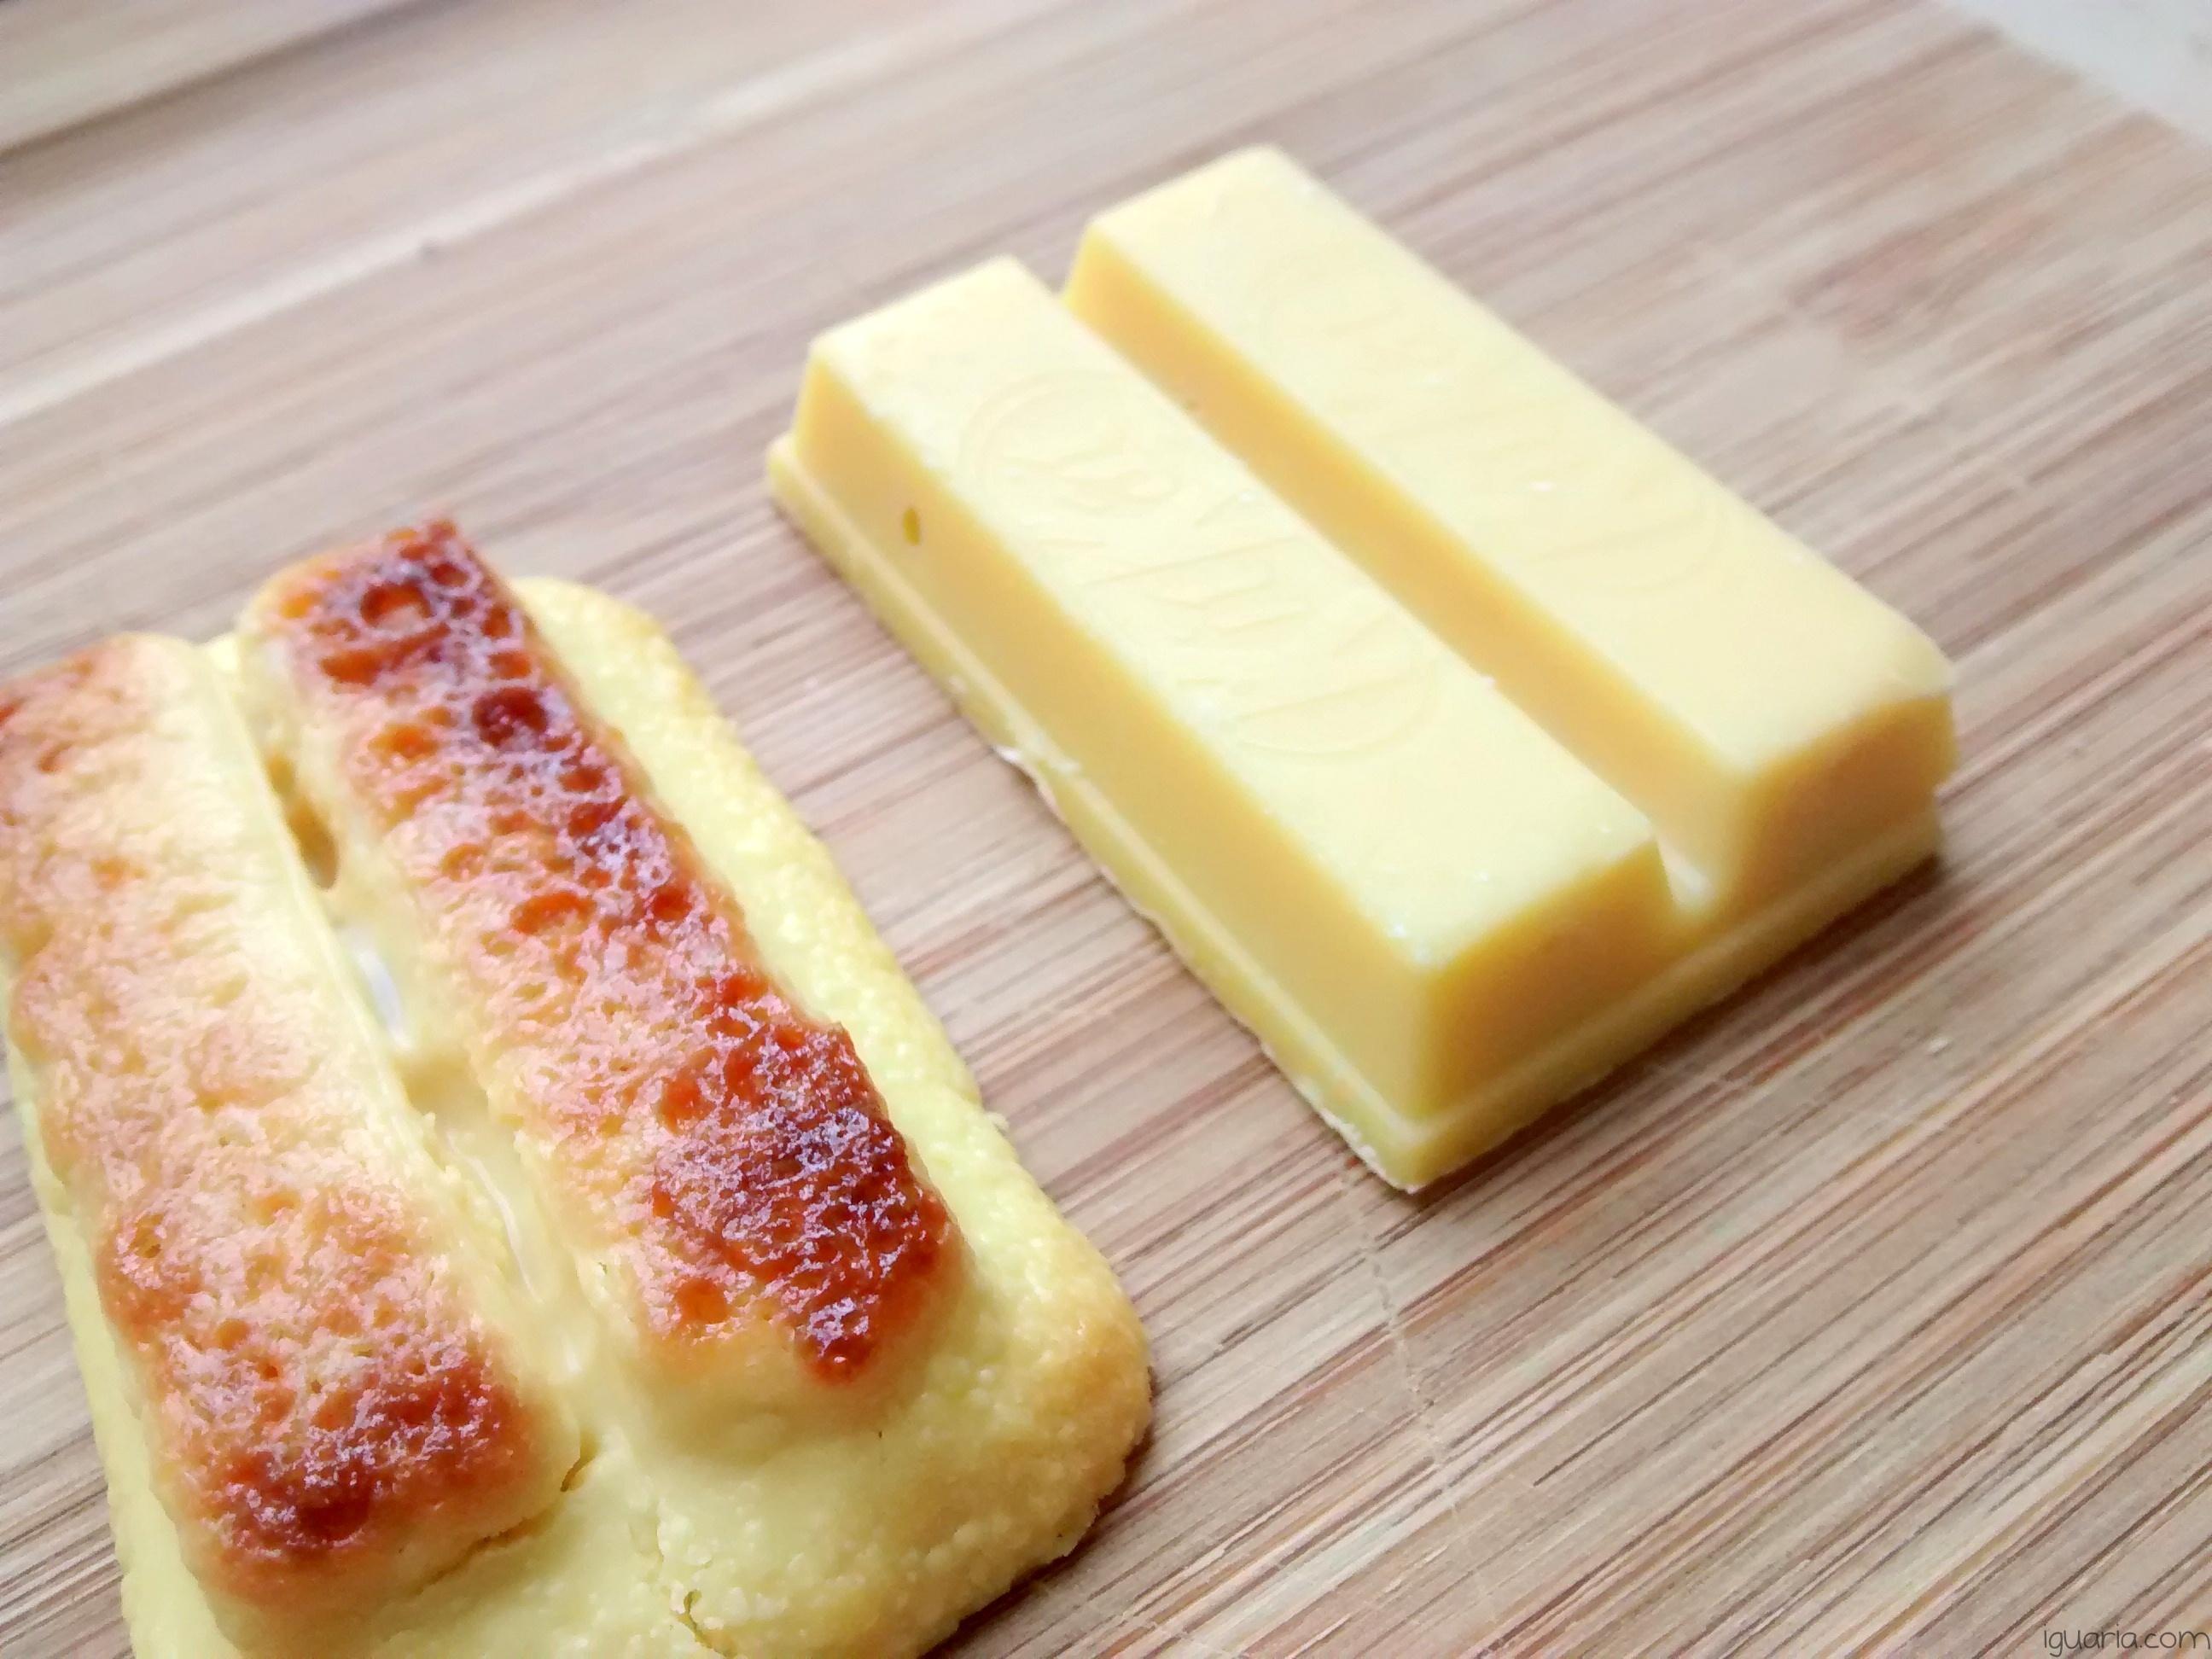 Iguaria_KitKat-Batata-Doce-Cozinhado